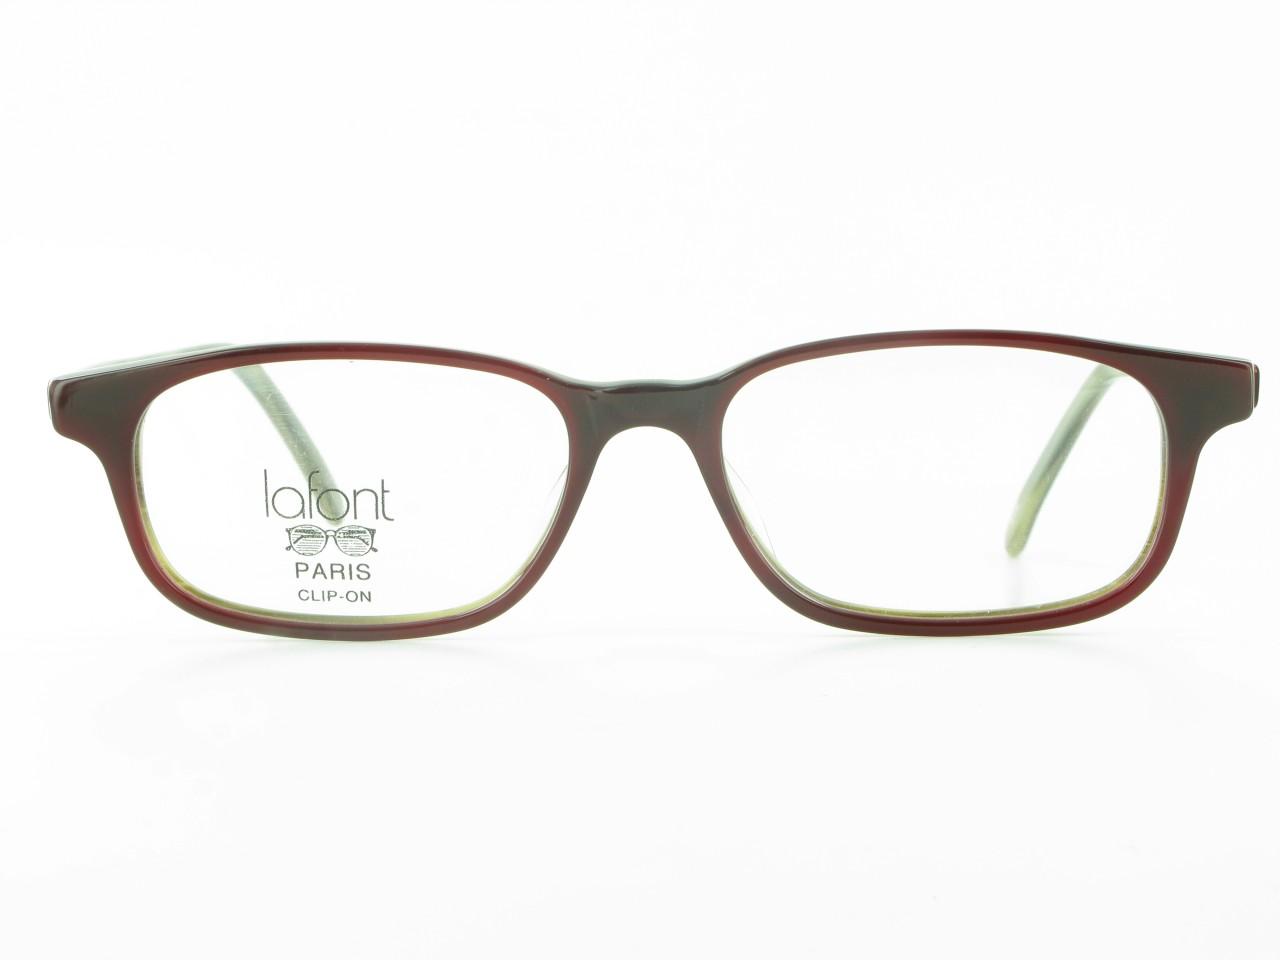 Eyeglass Frames Made In France : LAFONT PARIS Cursus EYEGLASS FRAMES Made In France